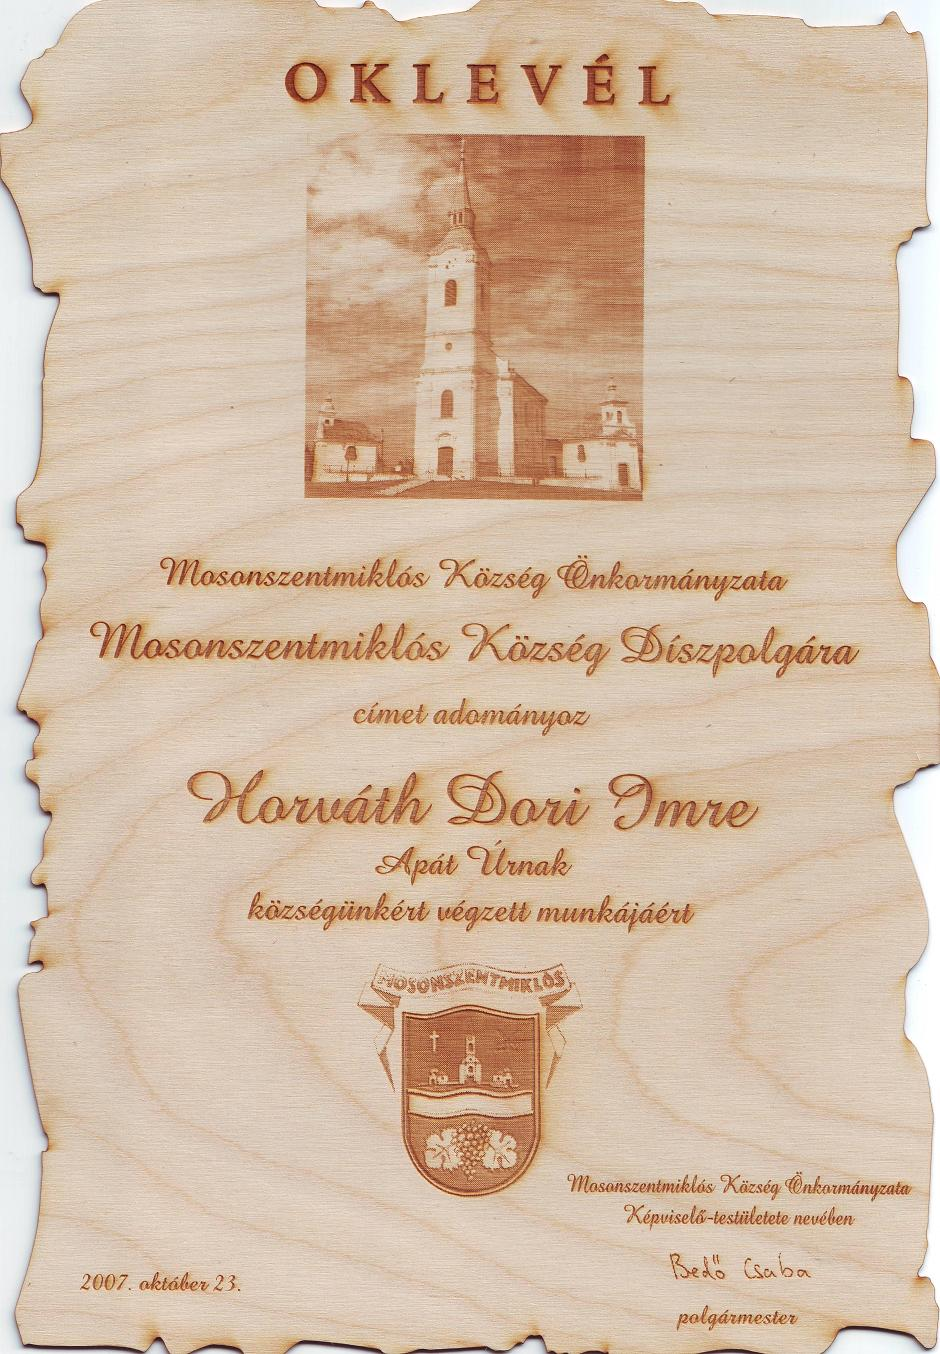 Horváth Dori